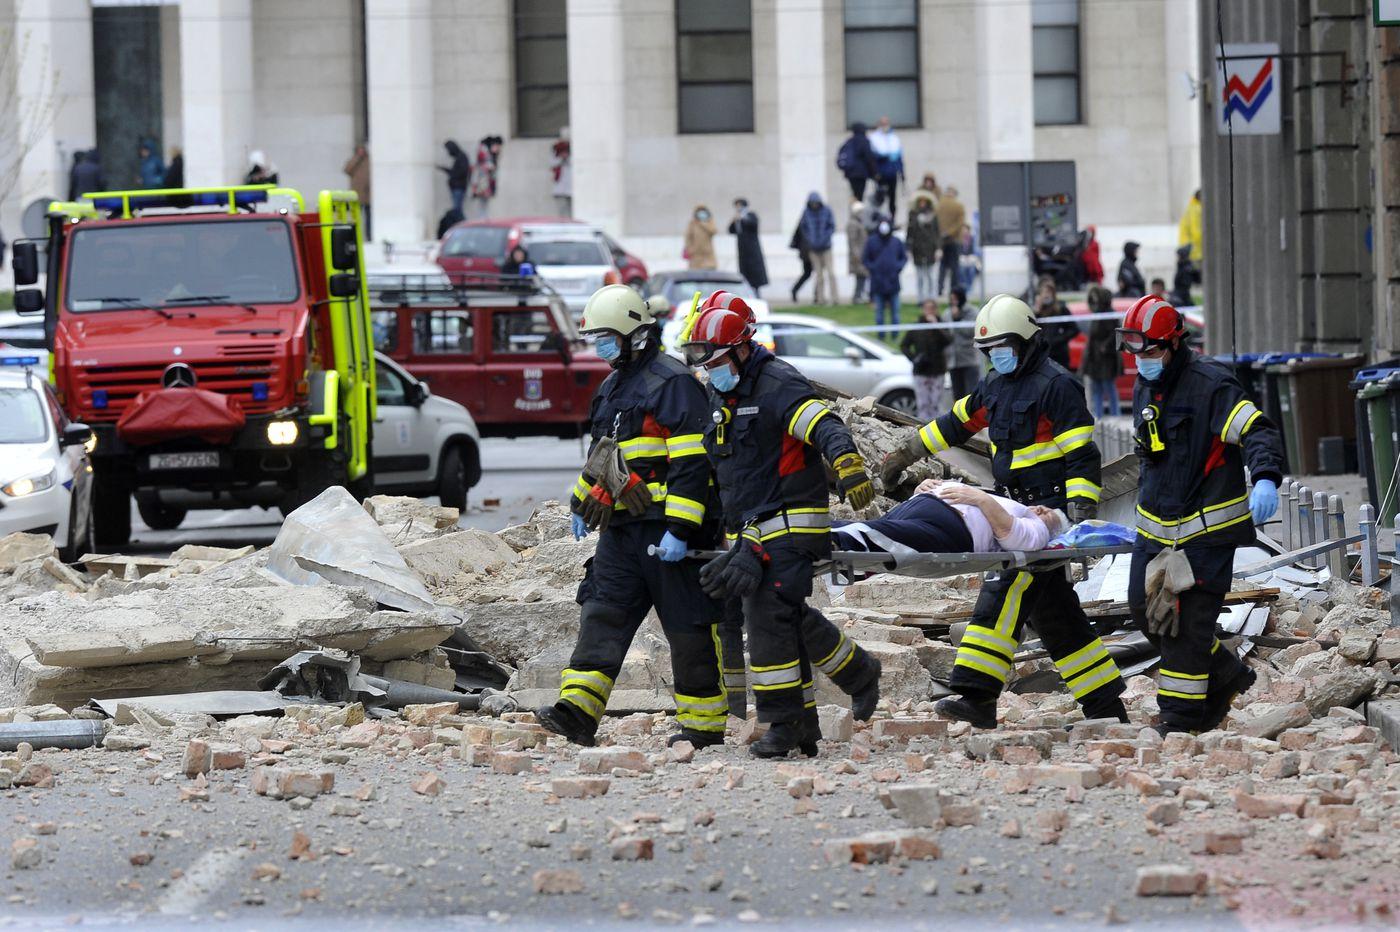 Earthquake in Croatia injures 17 amid partial coronavirus lockdown